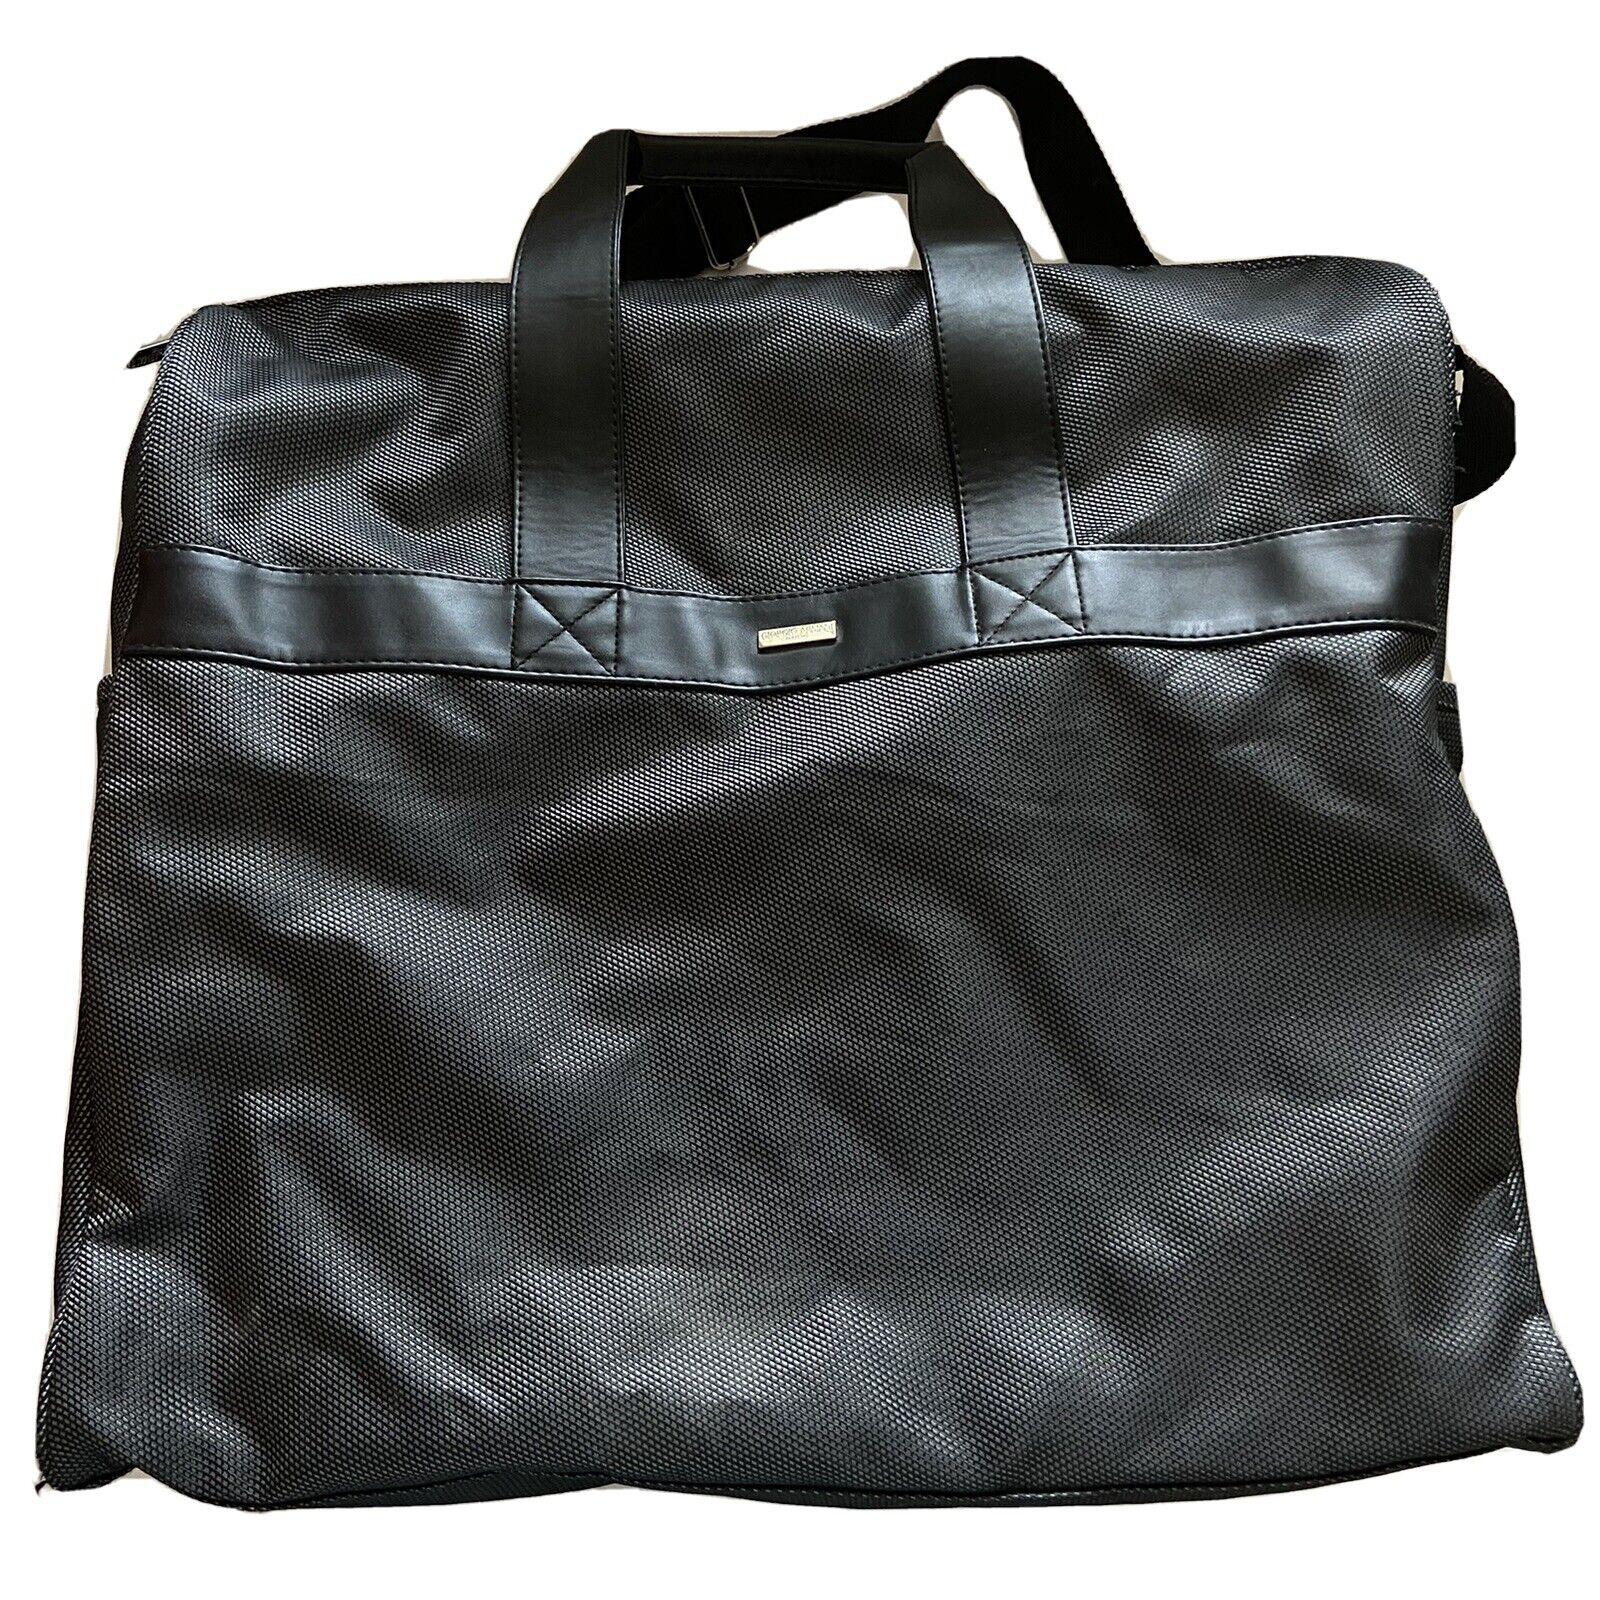 Giorgio Armani Parfums Bag Tote Overnight Woven Gray Travel Shoulder Strap